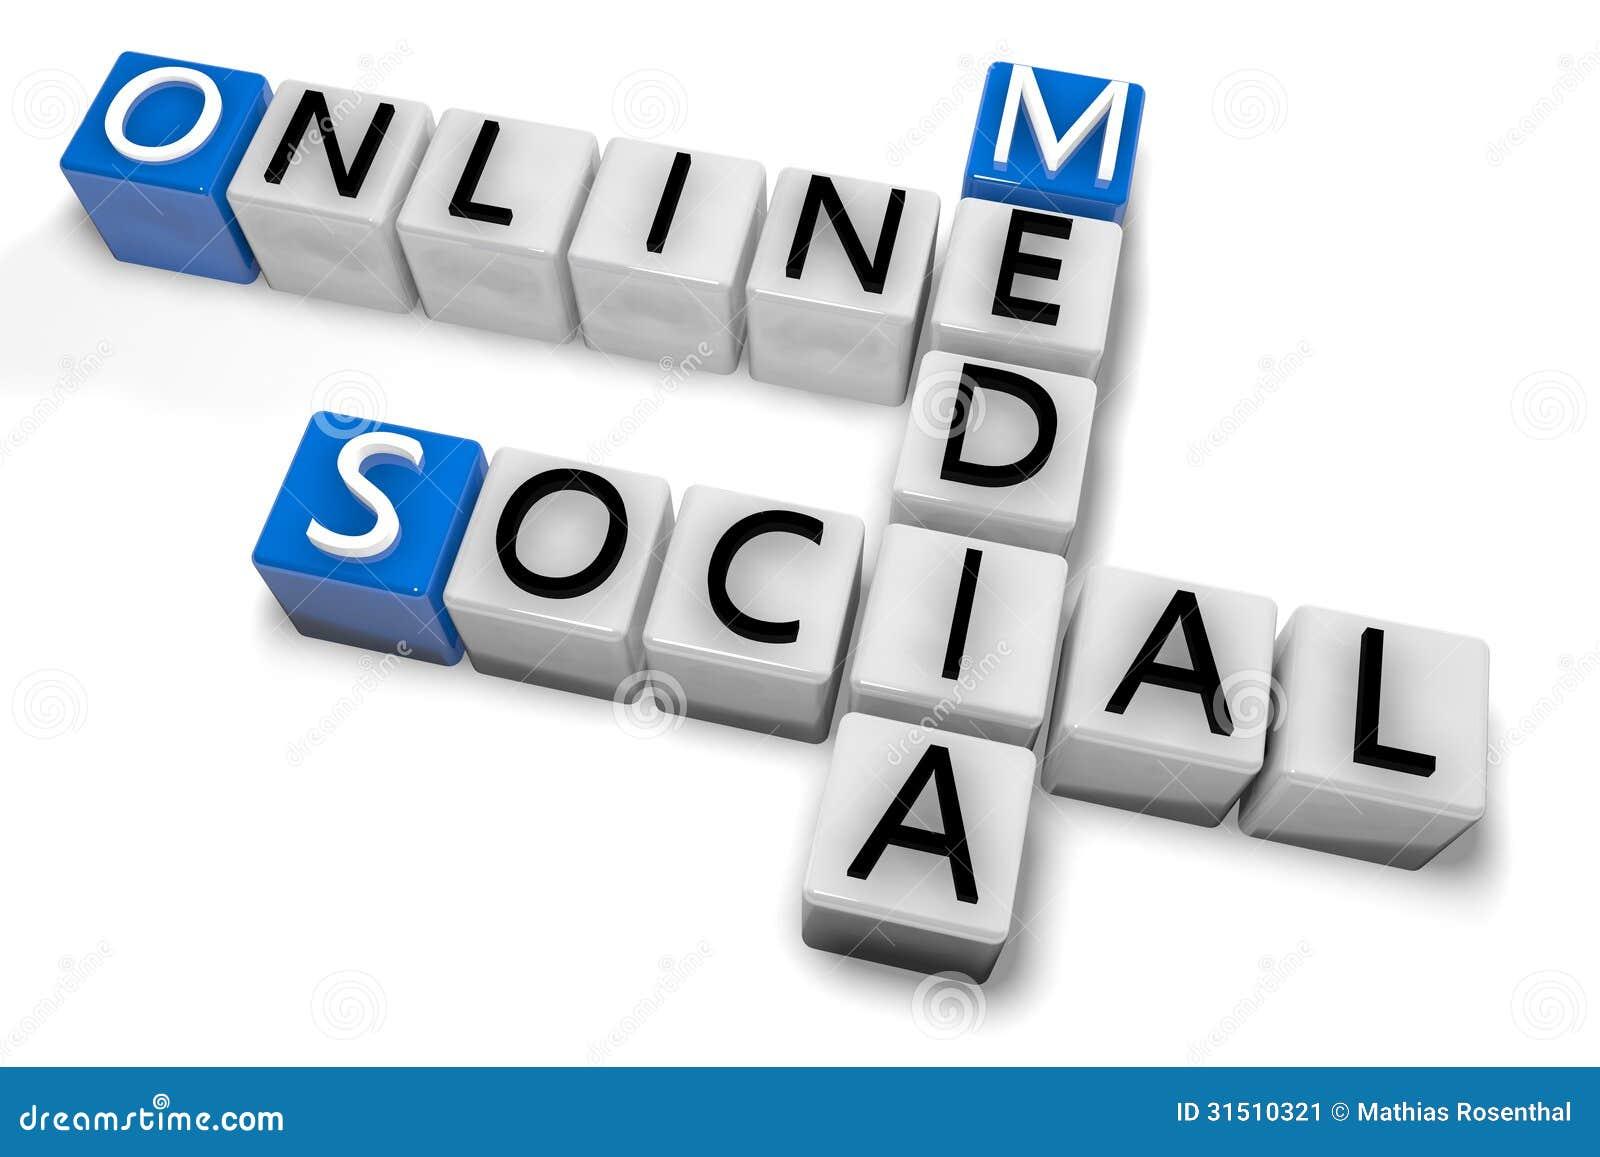 Crossword Online Social Media Stock Image Image 31510321